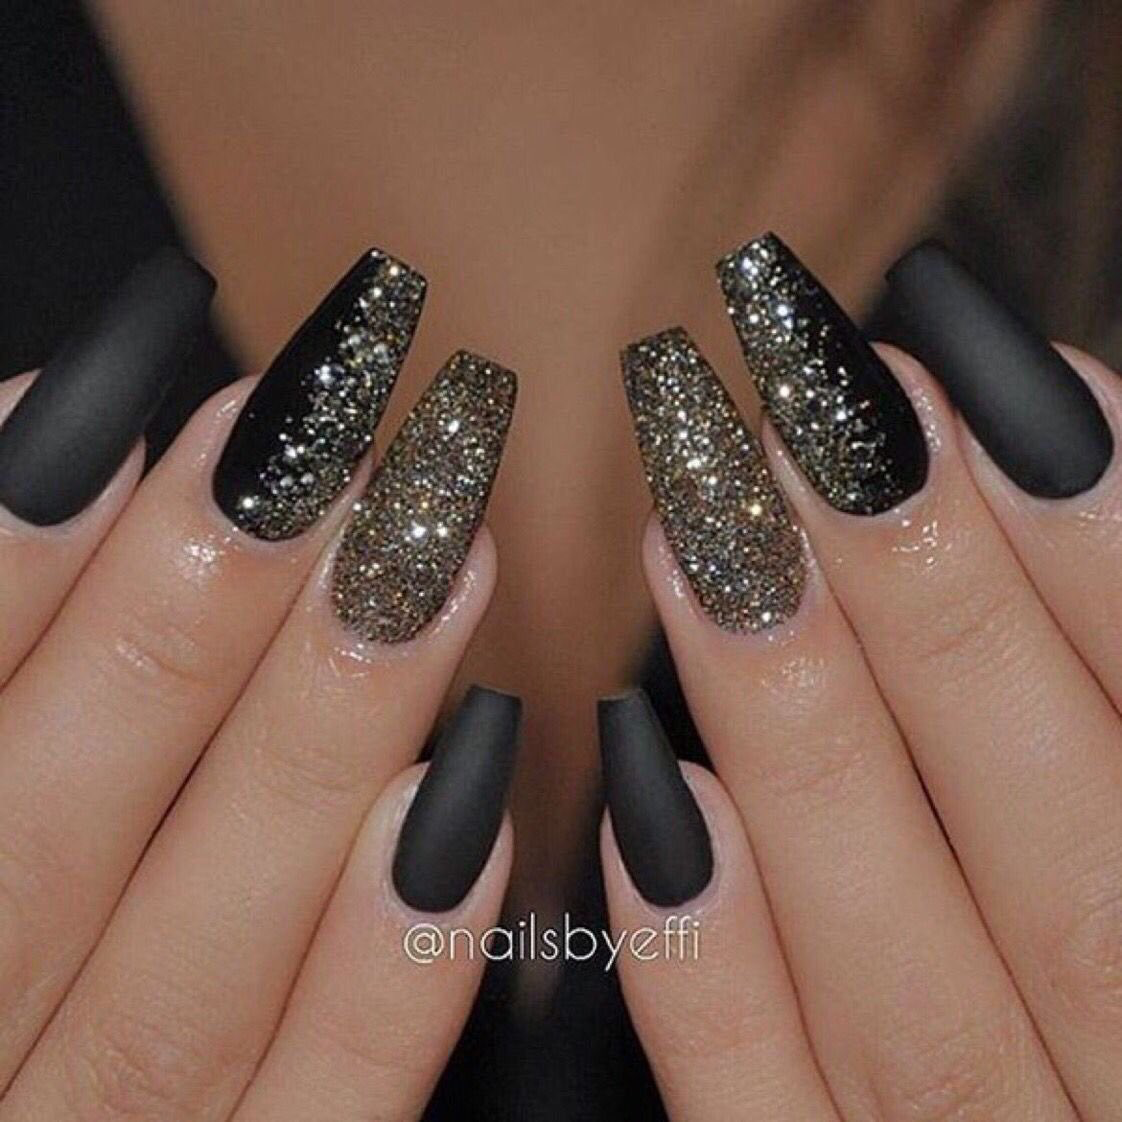 Pin de alfrea4772 en Make up and nails and hair | Pinterest